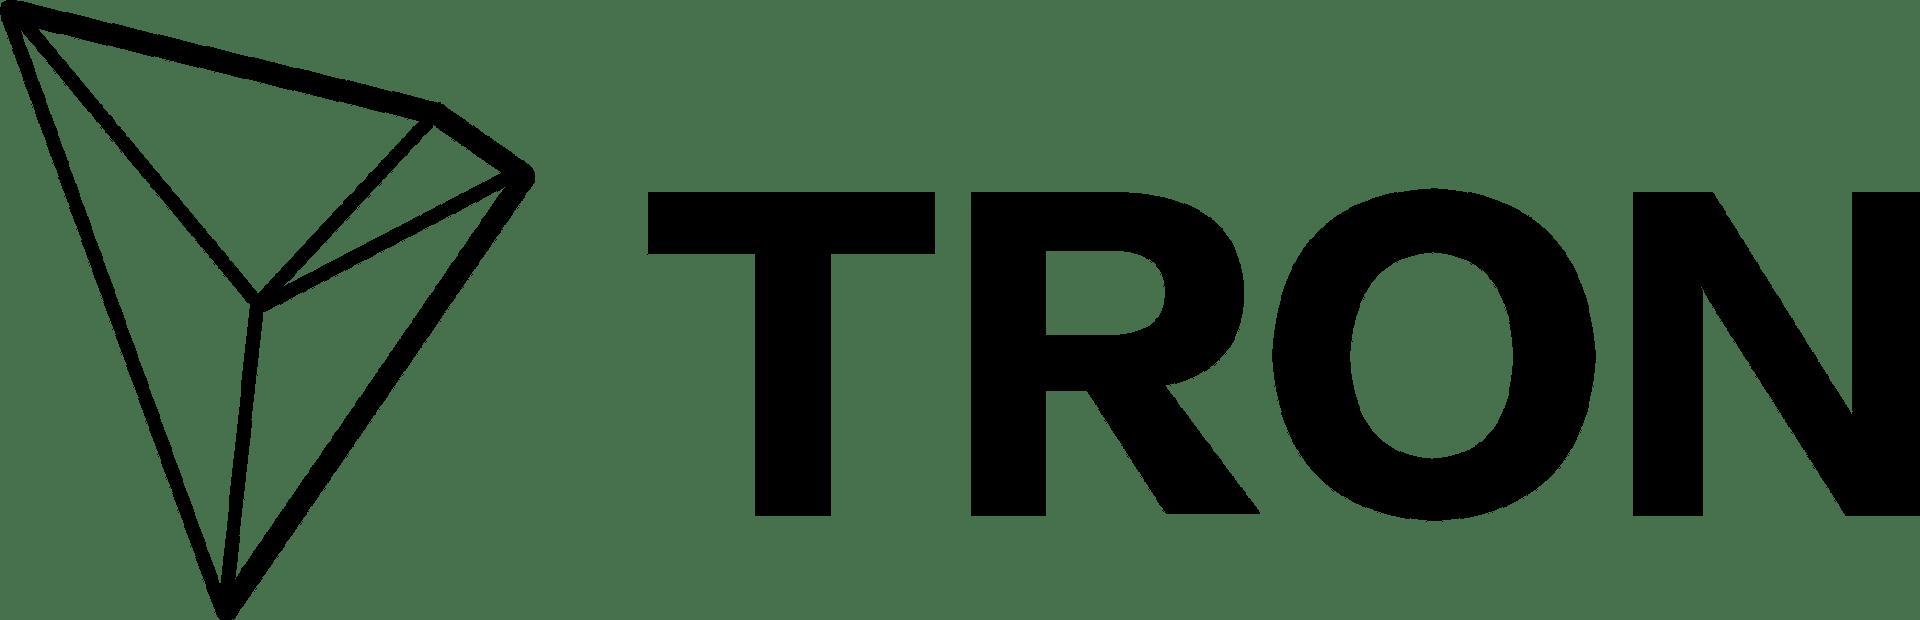 http://www.freelogovectors.net/wp-content/uploads/2018/02/tron-logo